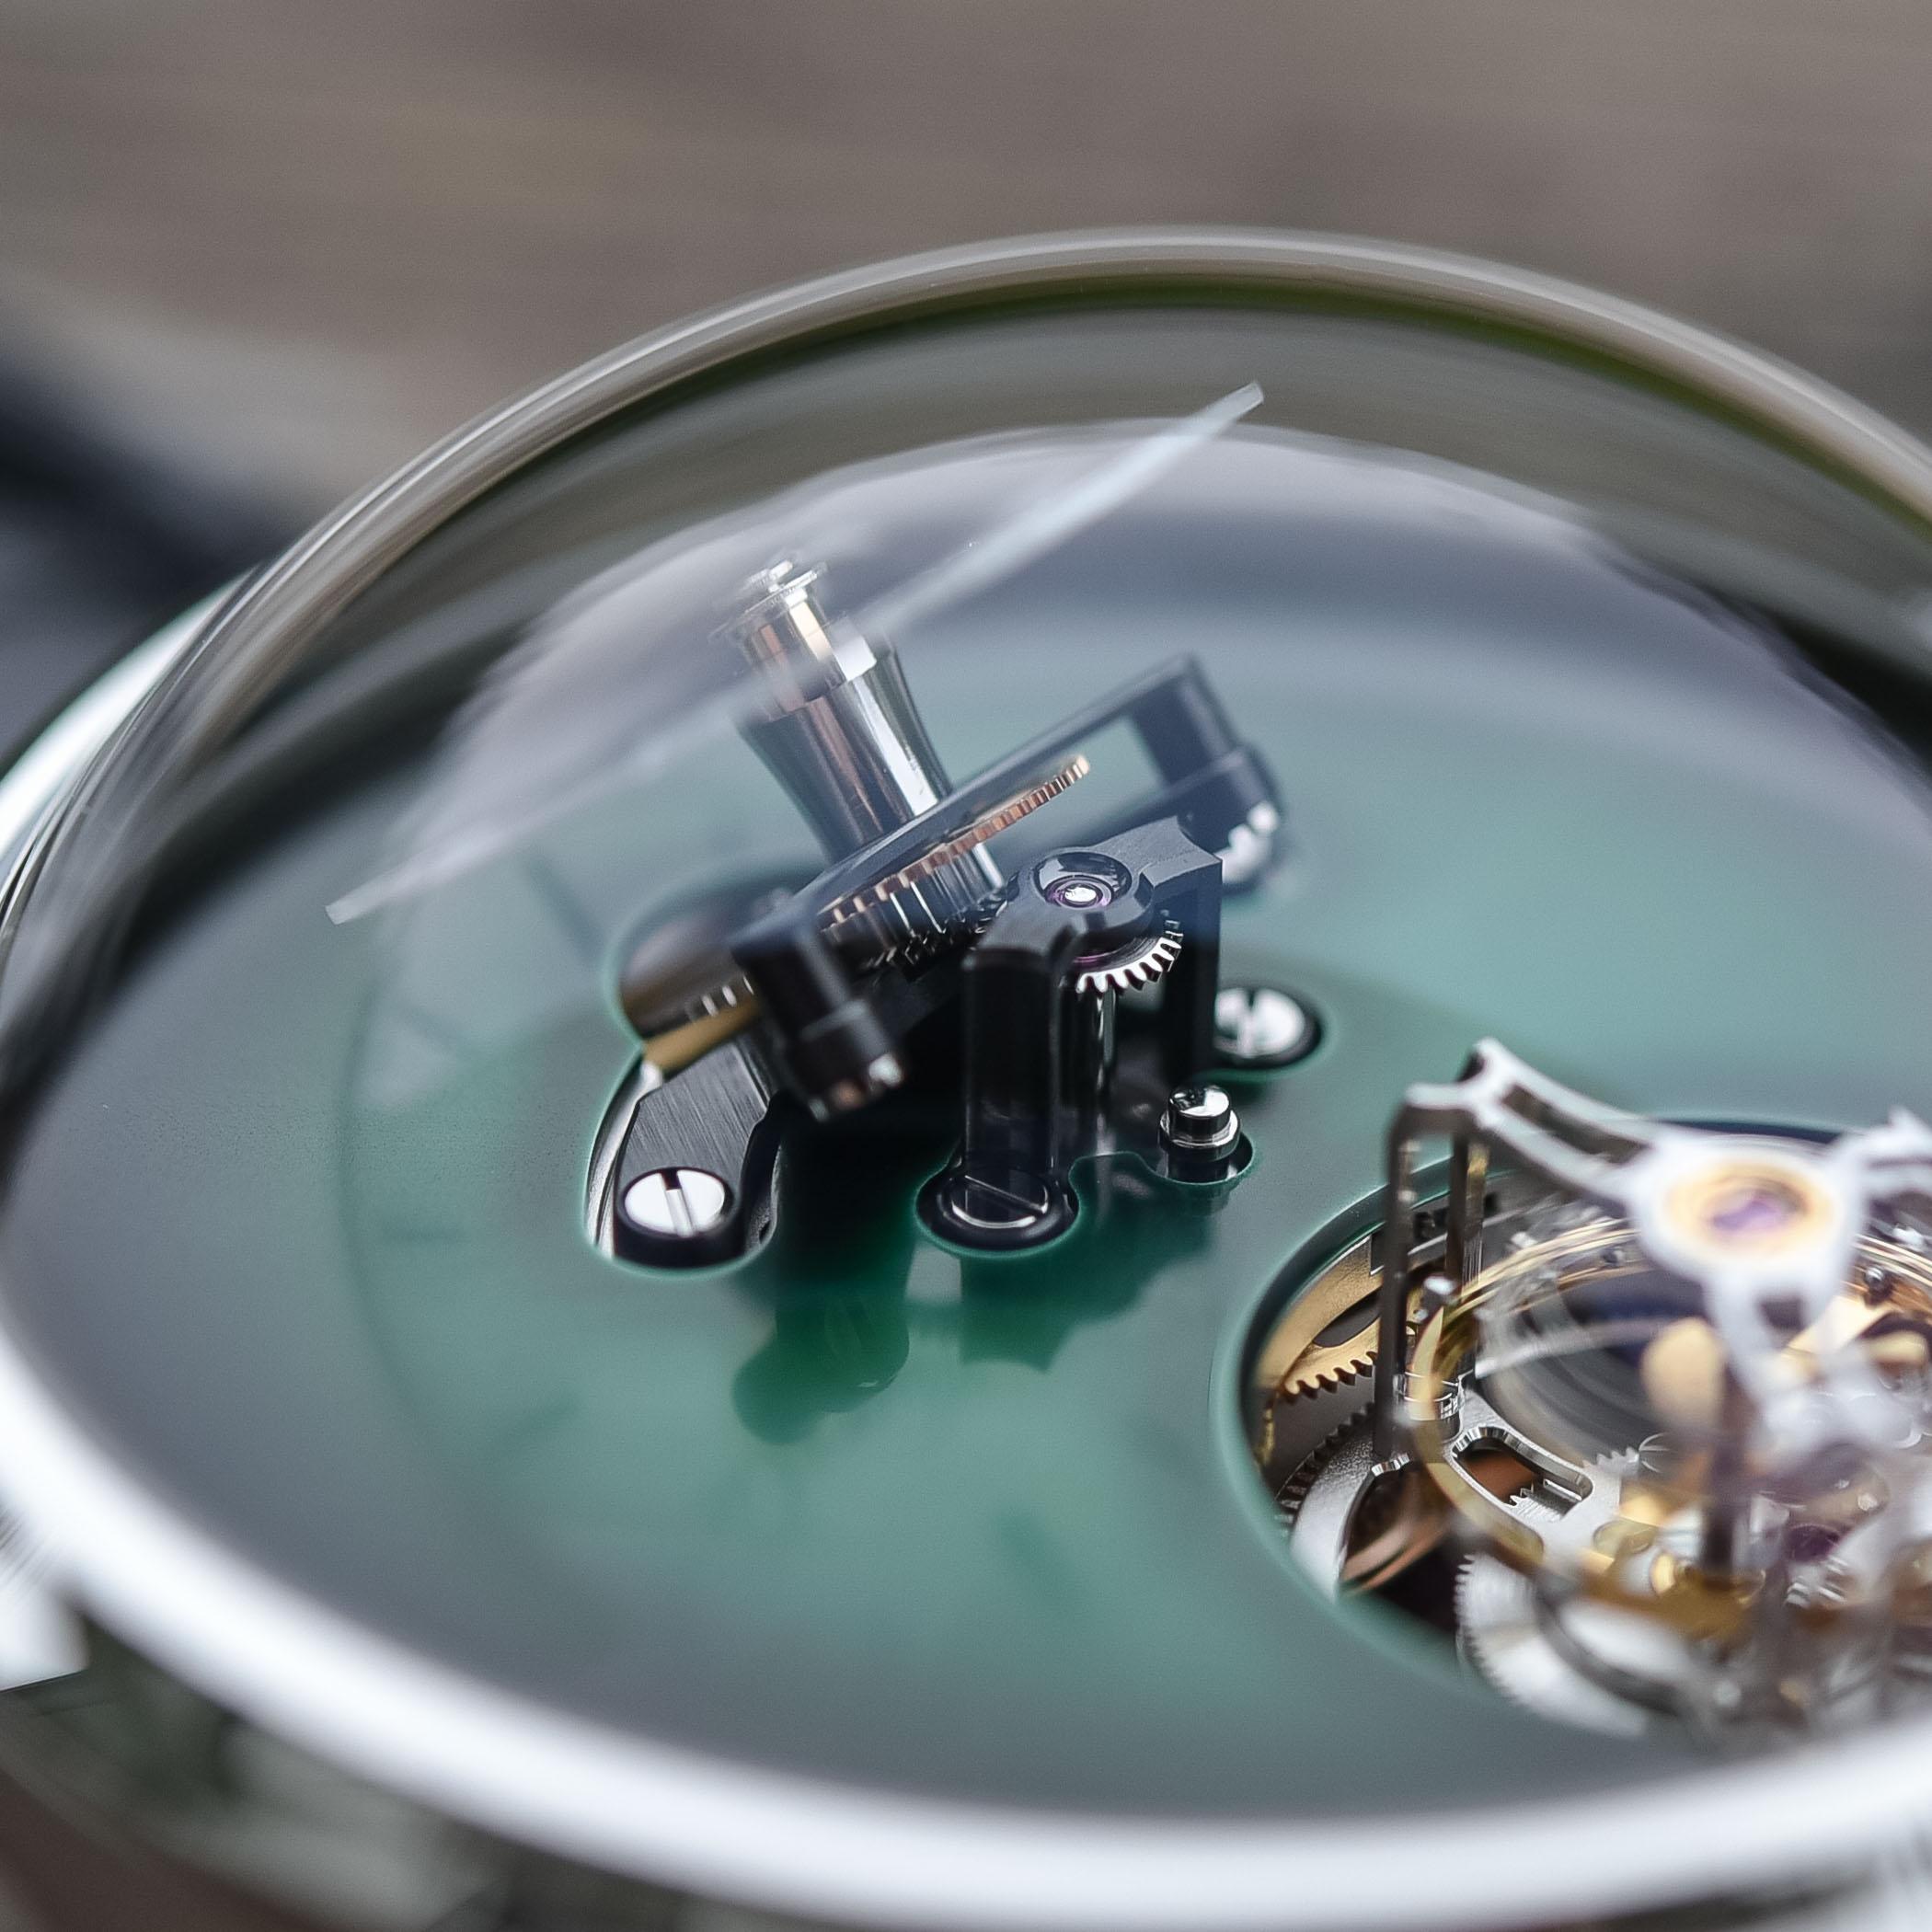 Moser MBandF Endeavour Cylindrical Tourbillon - 13